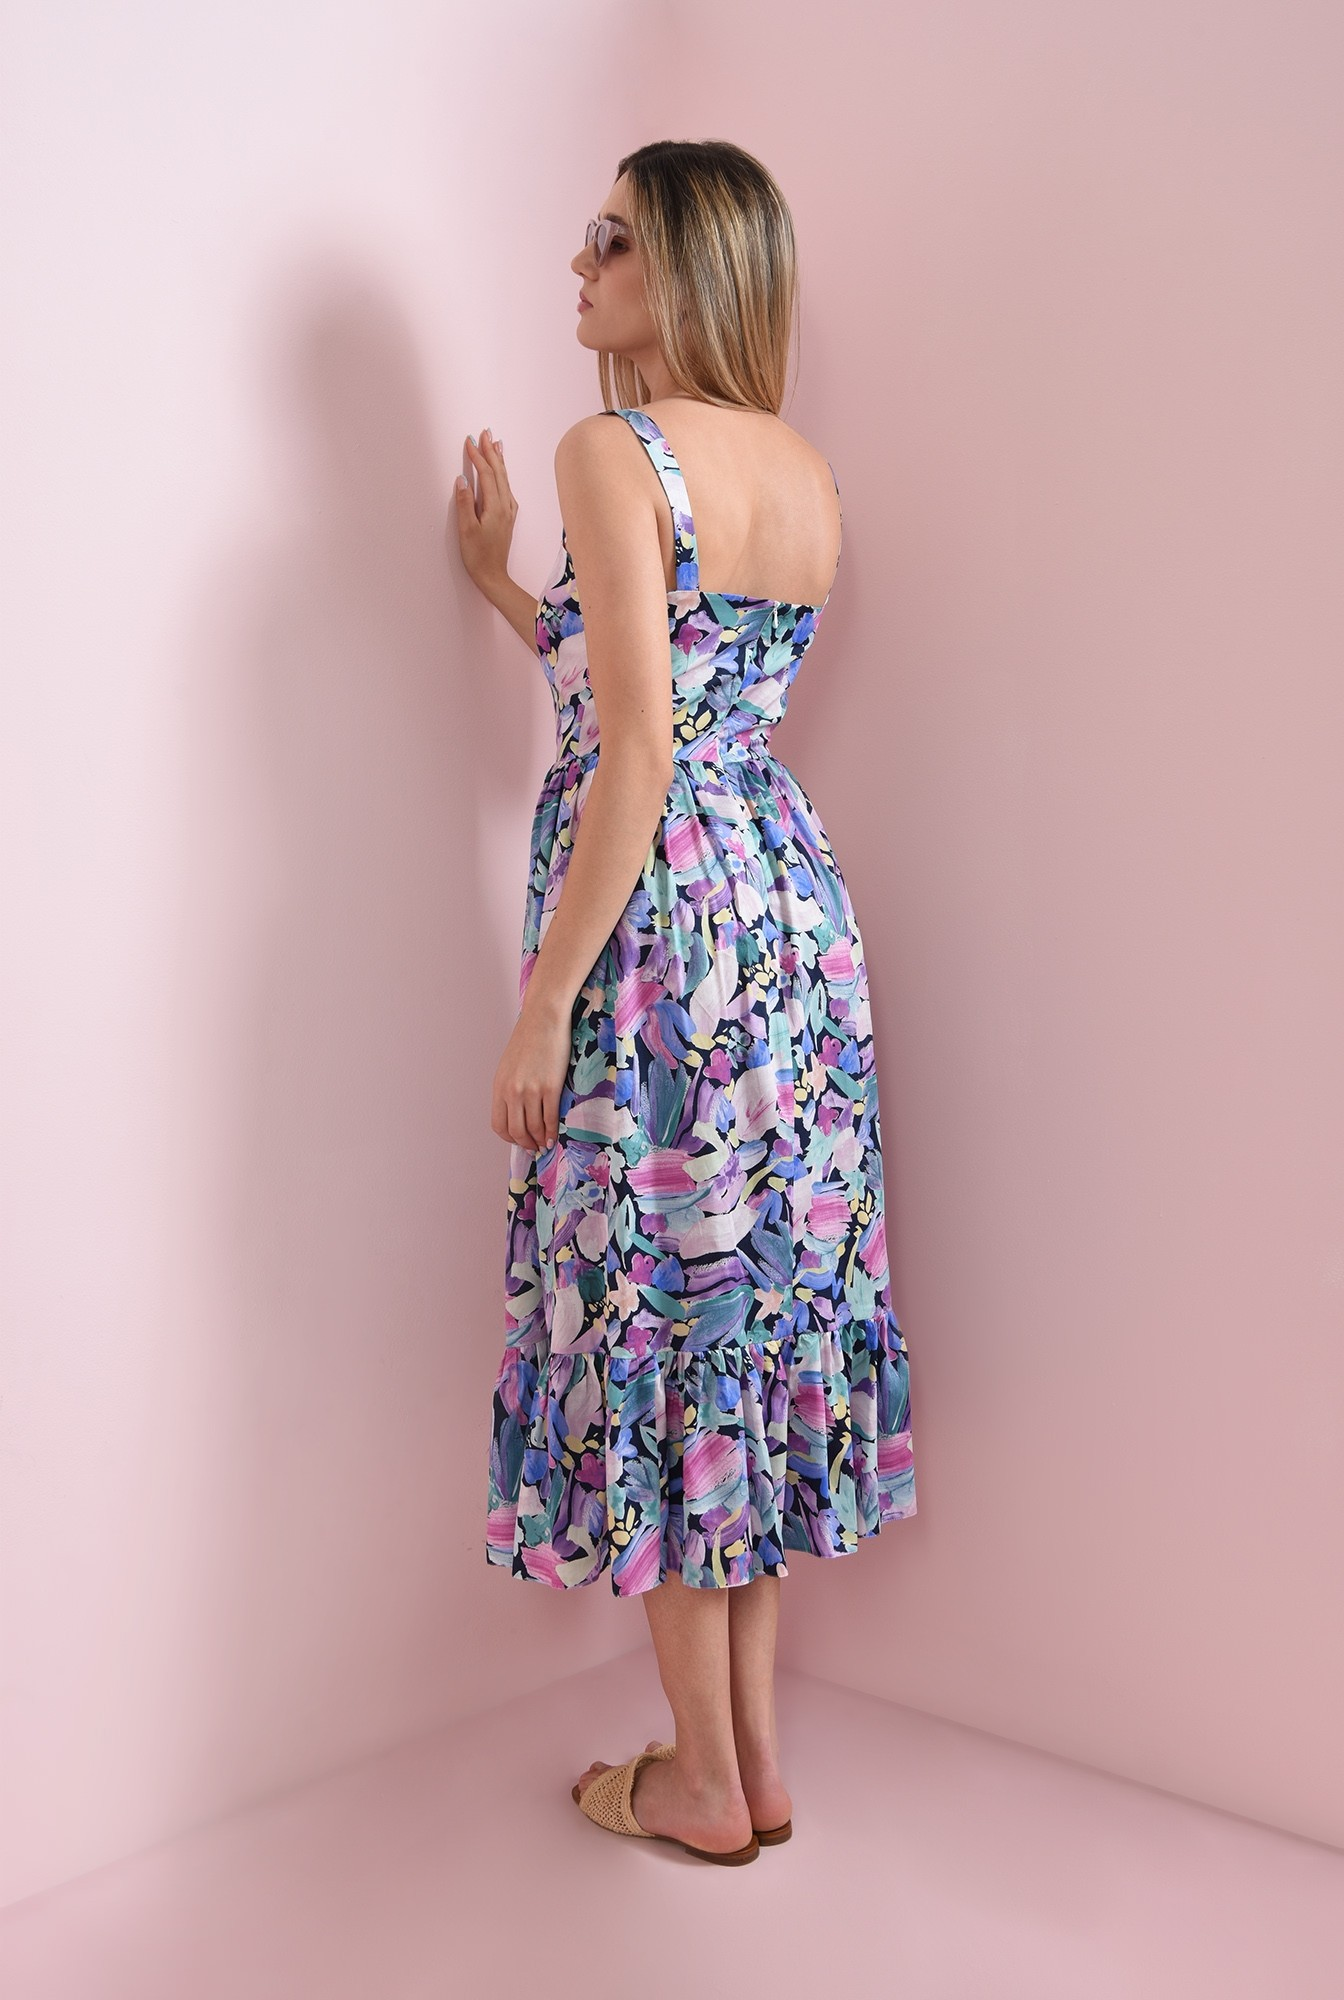 2 - rochie cu imprimeu multicolor, cu bretele